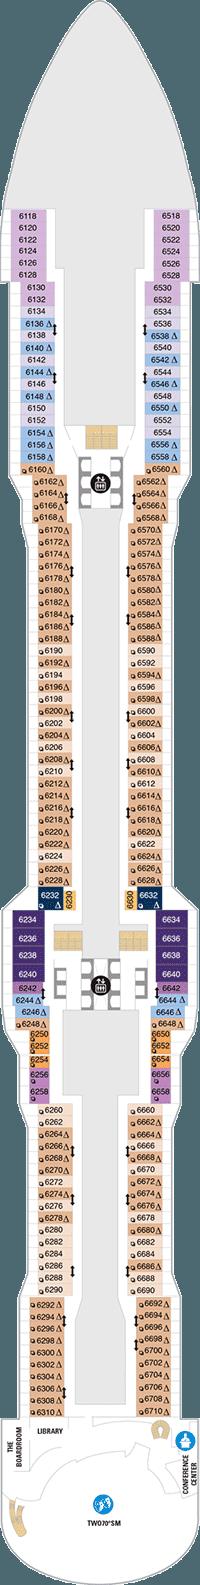 Spectrum of the Seas Deck 6